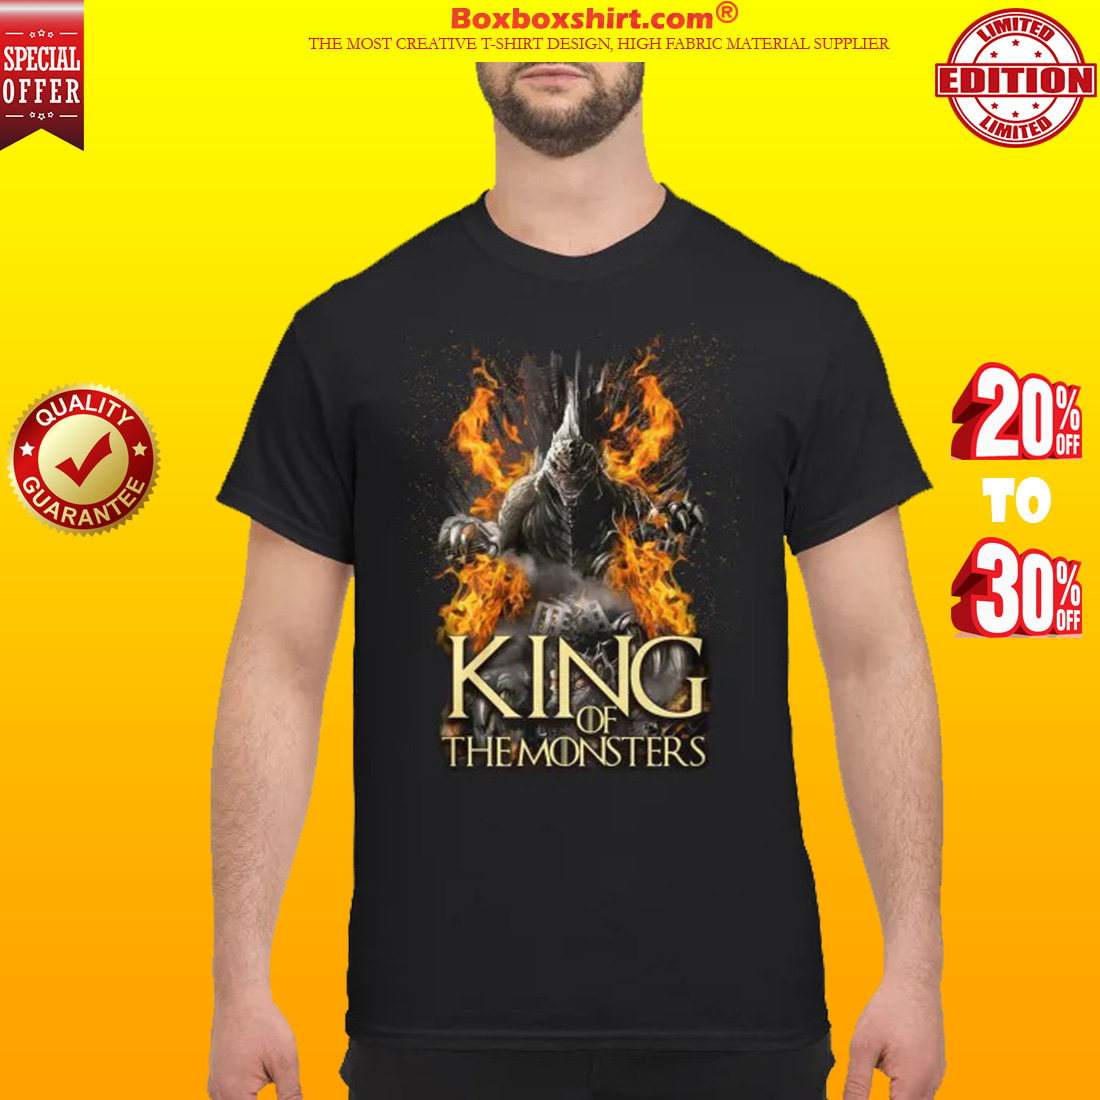 Godzilla king of the monsters classic shirt